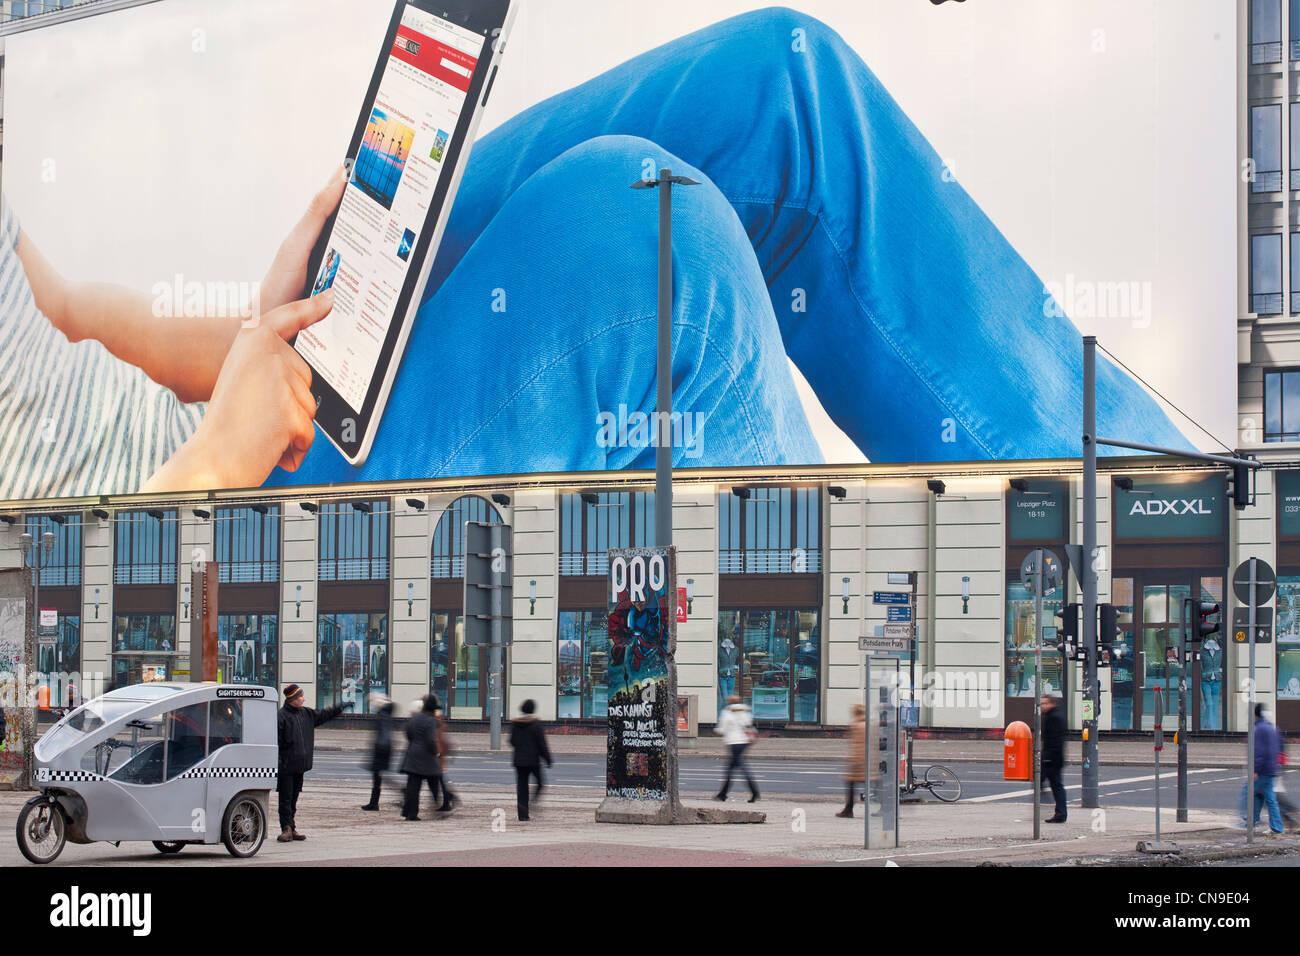 Alemania, Berlín Mitte, Postdamer Platz, un I-Pad publicidad Imagen De Stock